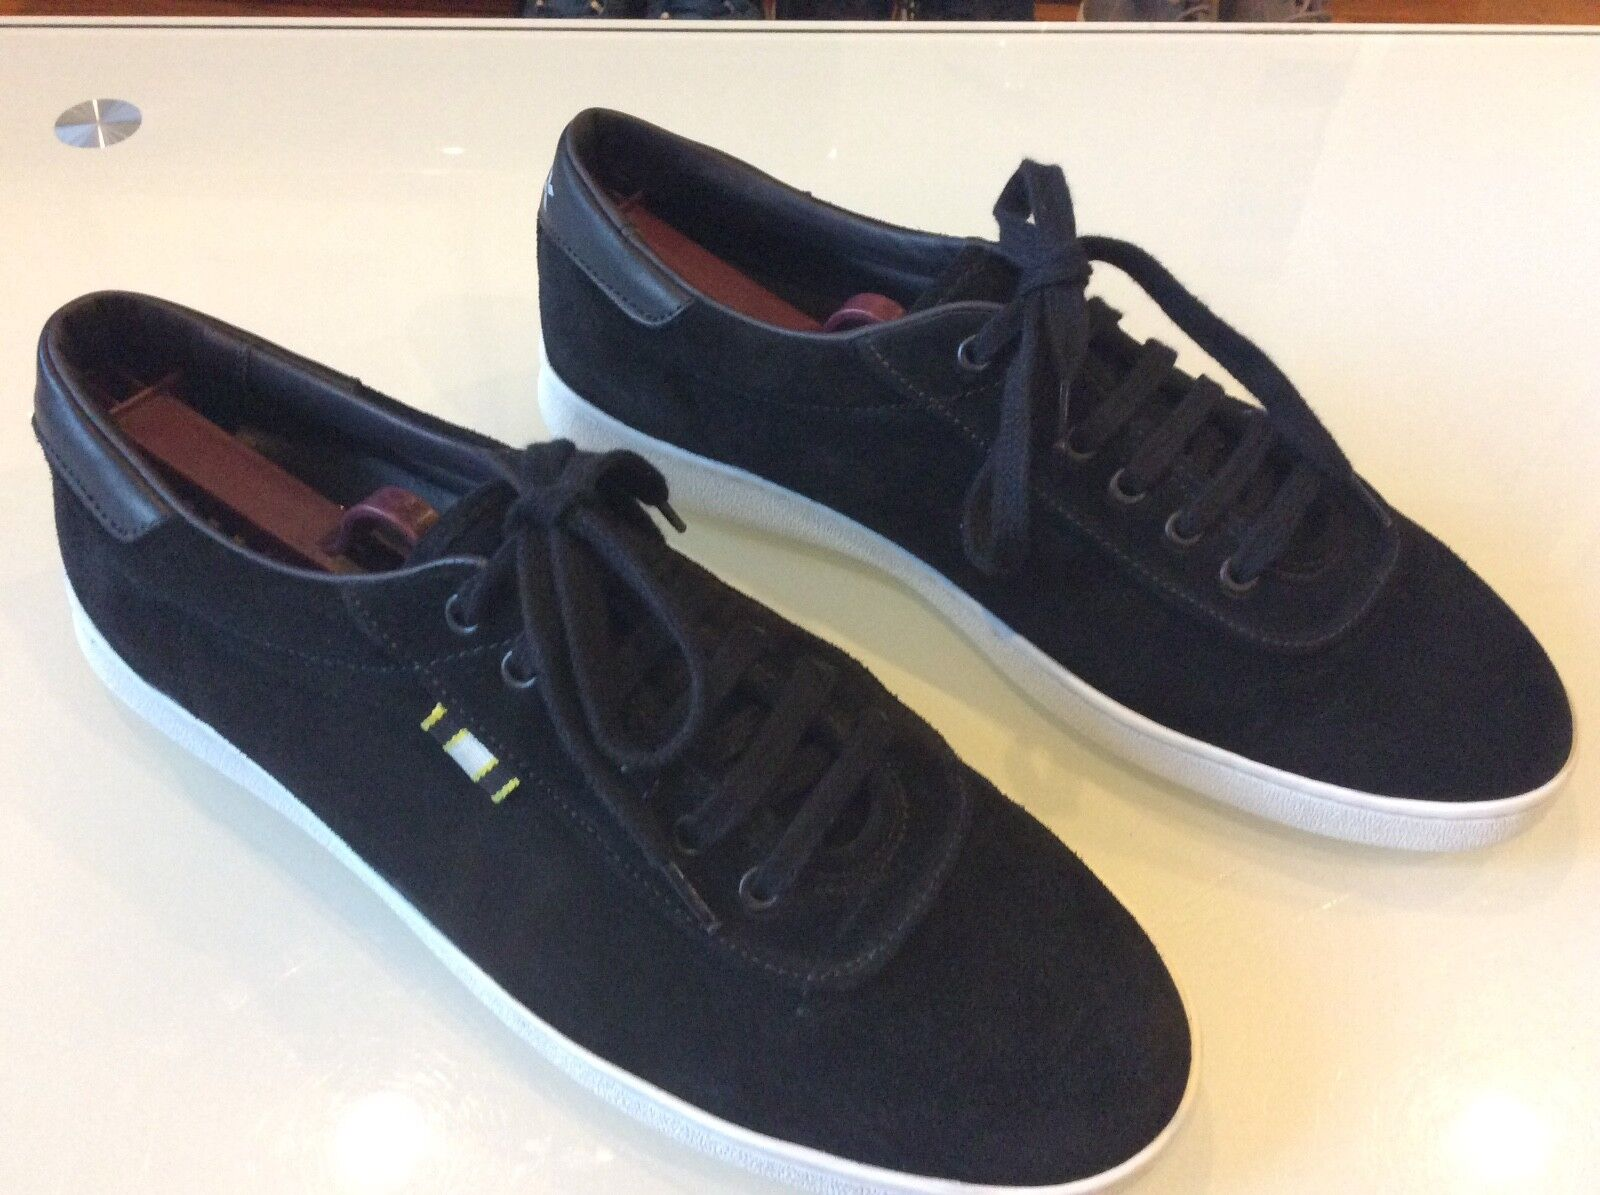 Aprix Men's Black Suede low tops Sneakers size 43  9US  74.00